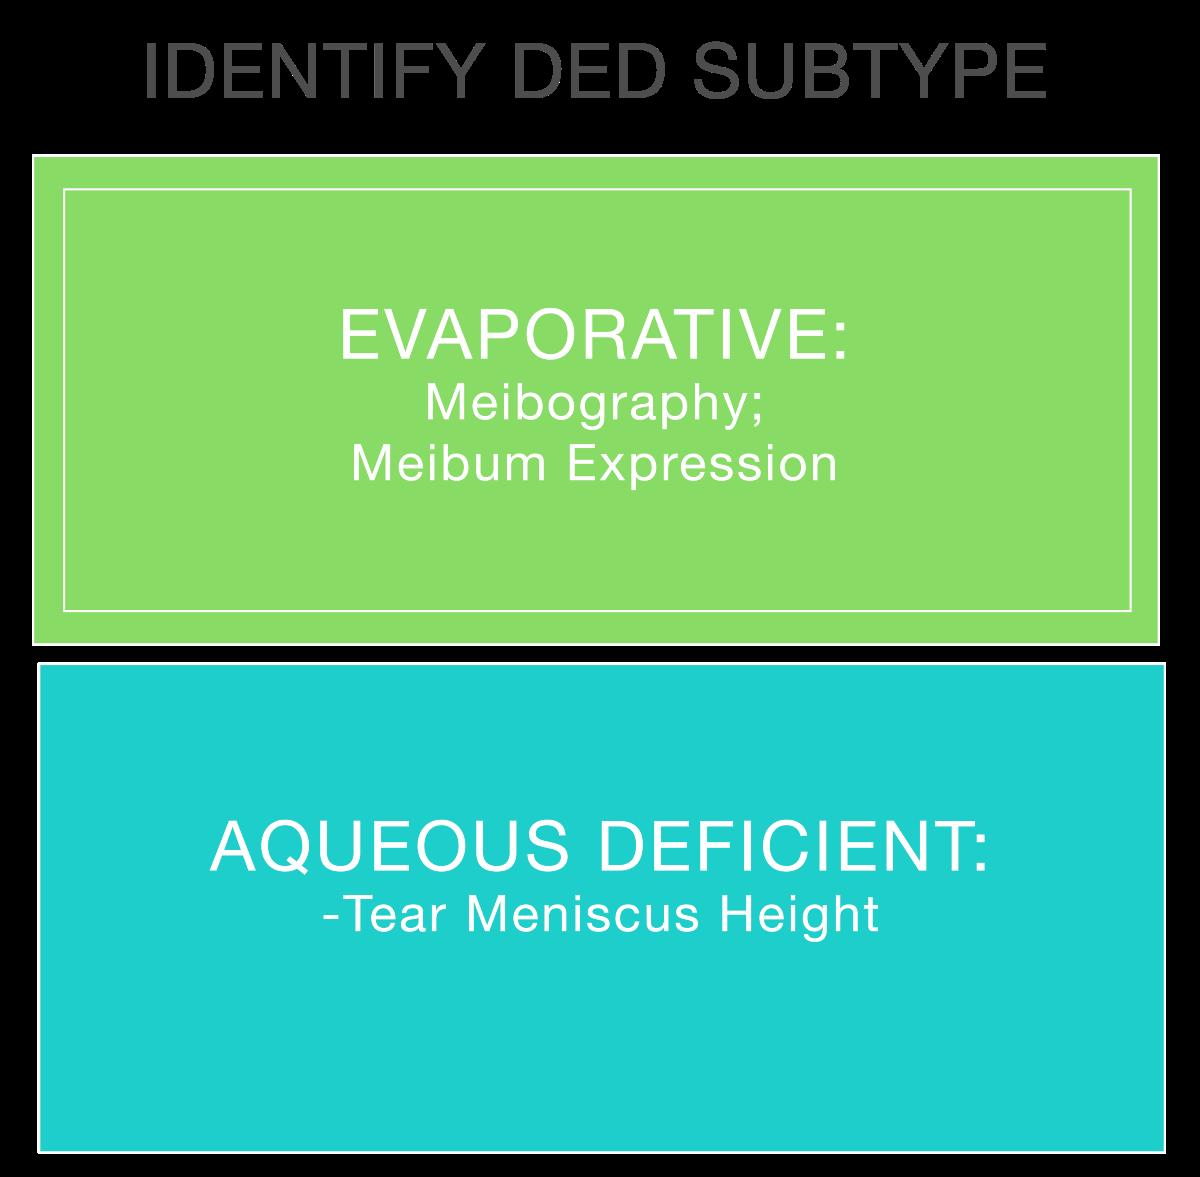 Meibography